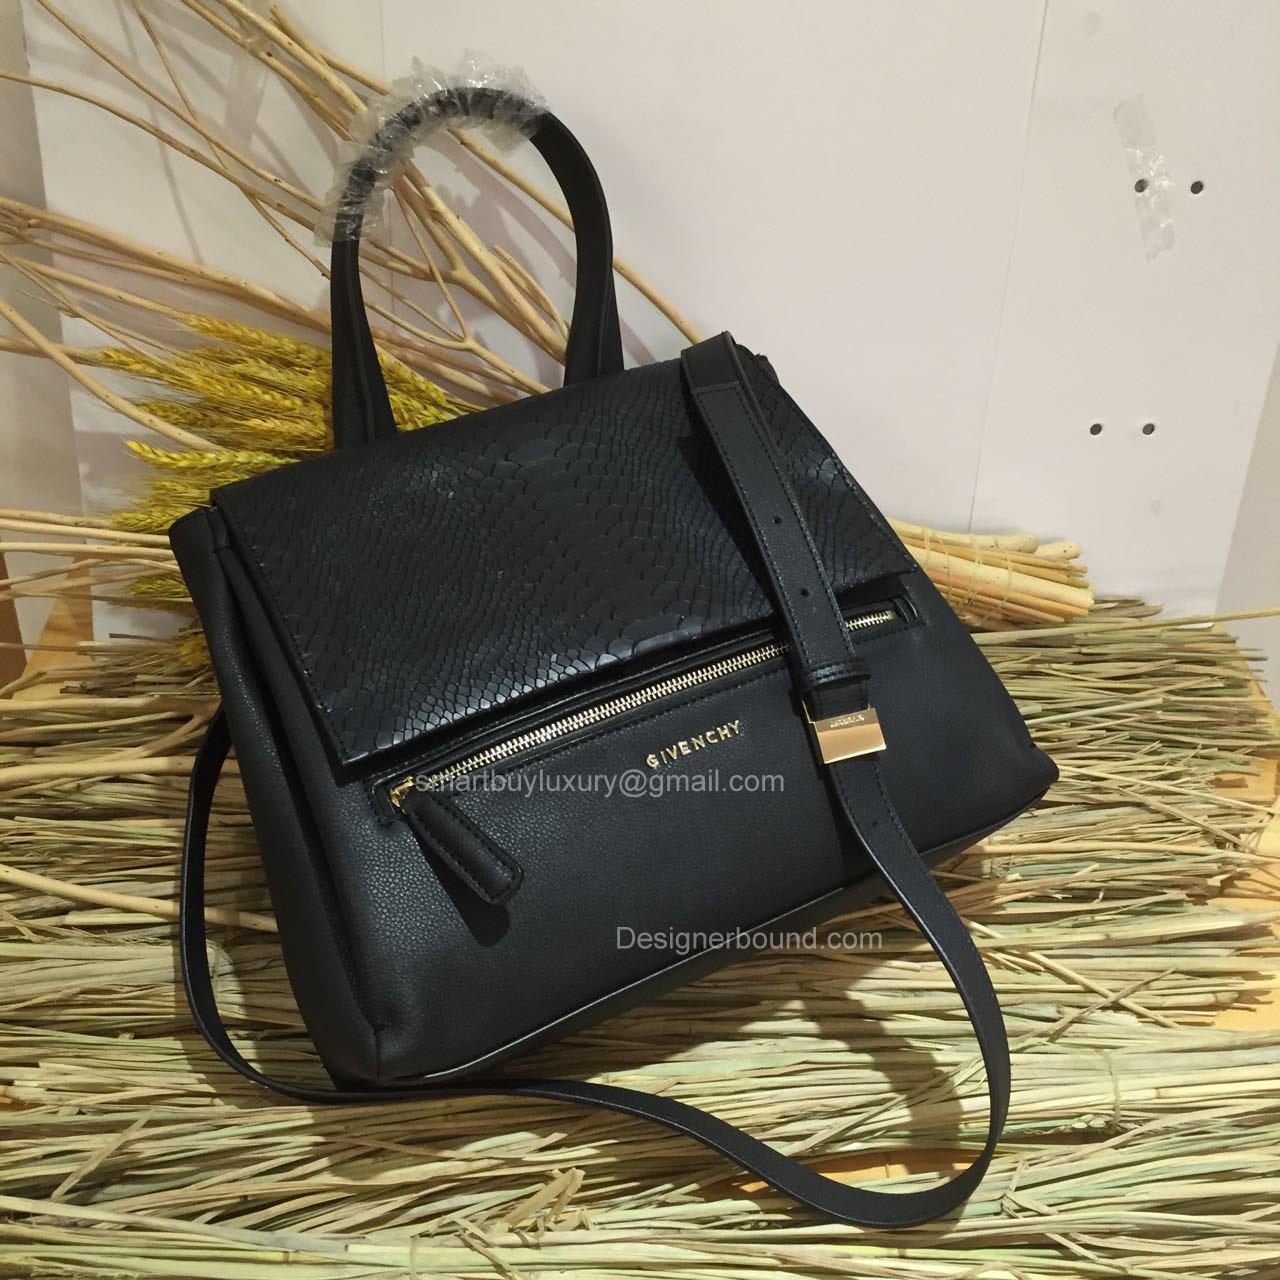 fcbb60b6c8 Givenchy Pandora Pure Medium Black Bag with Python Pattern Flap 286139 -